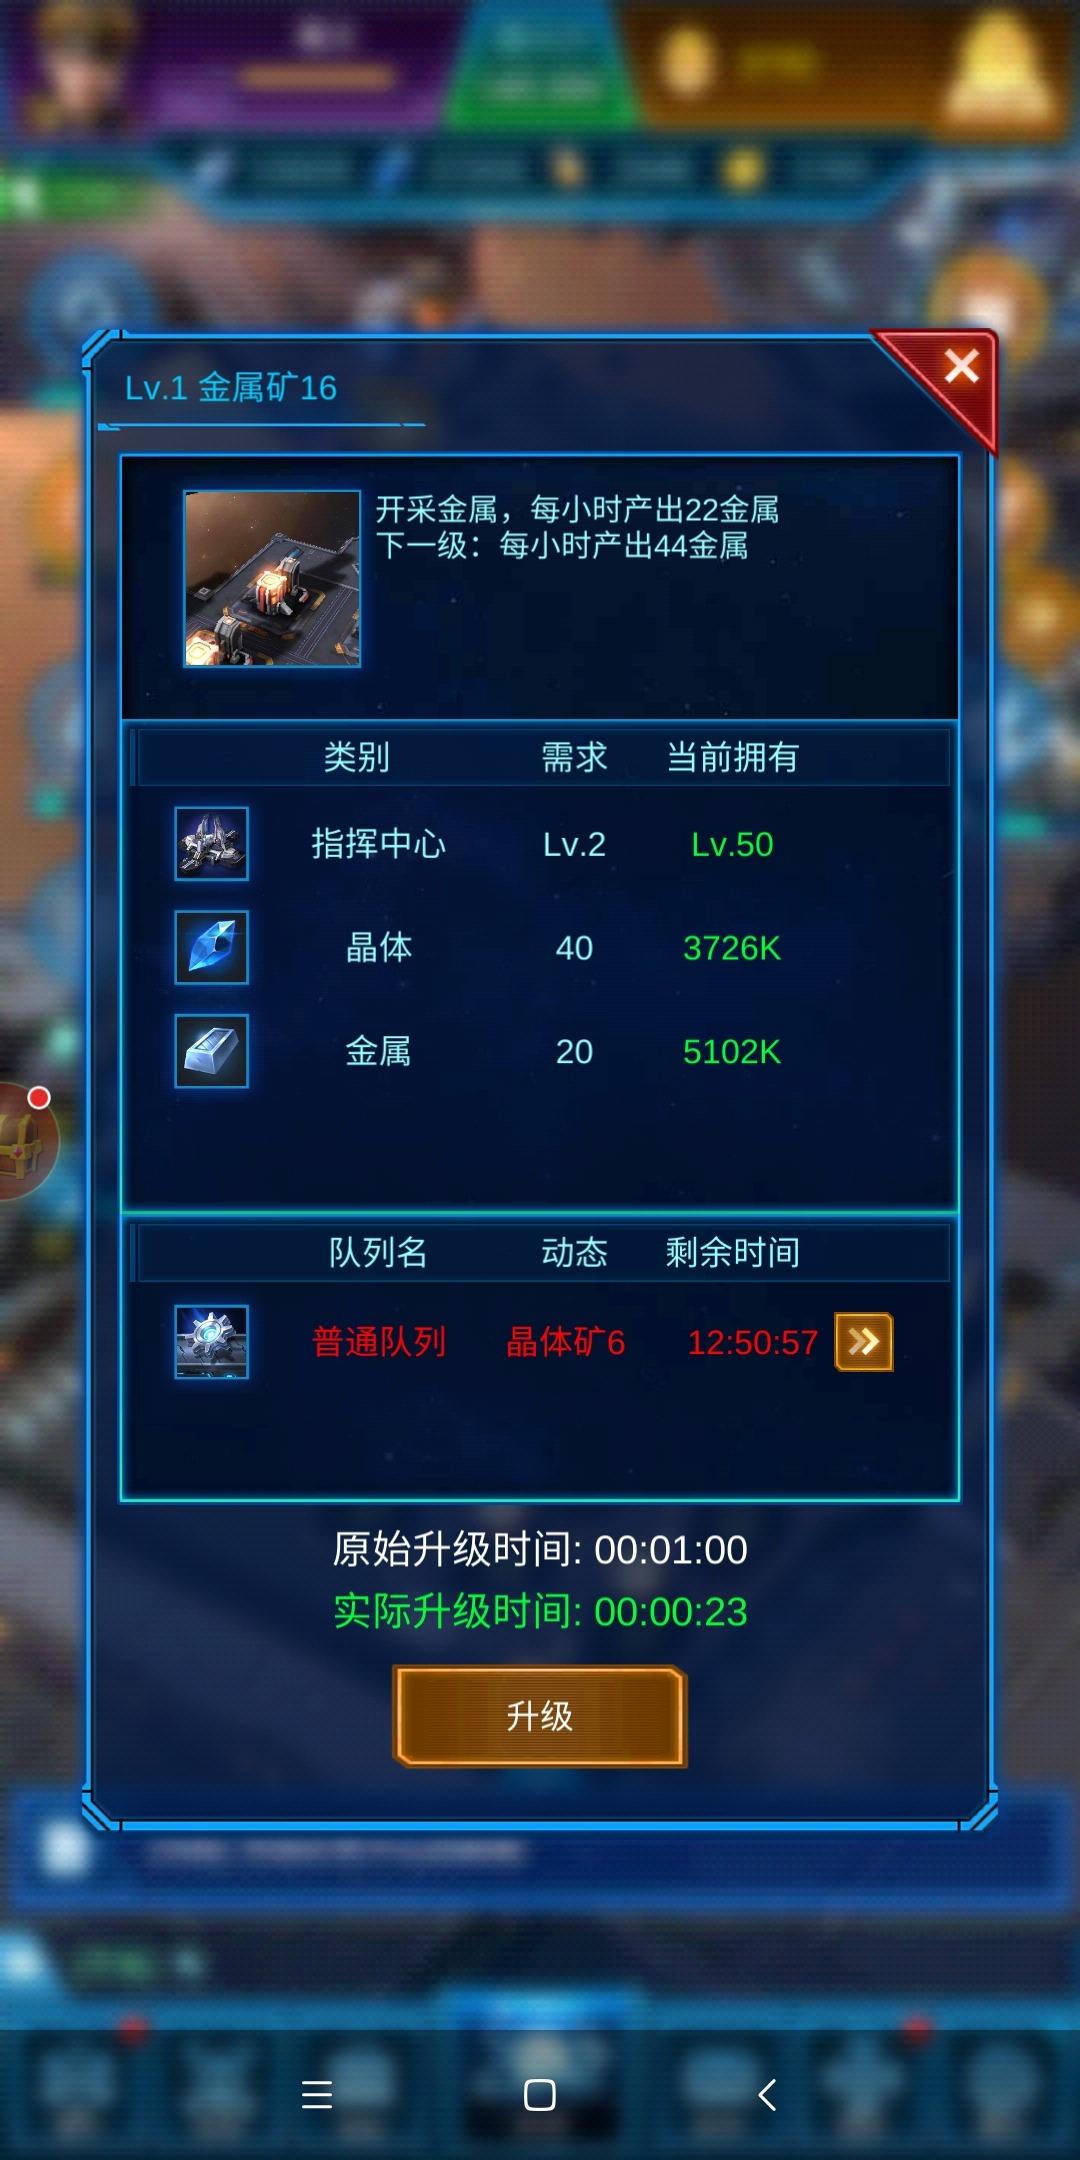 Screenshot_2020-04-28-18-46-46-932_com.jedigames.p16s.mi.jpg